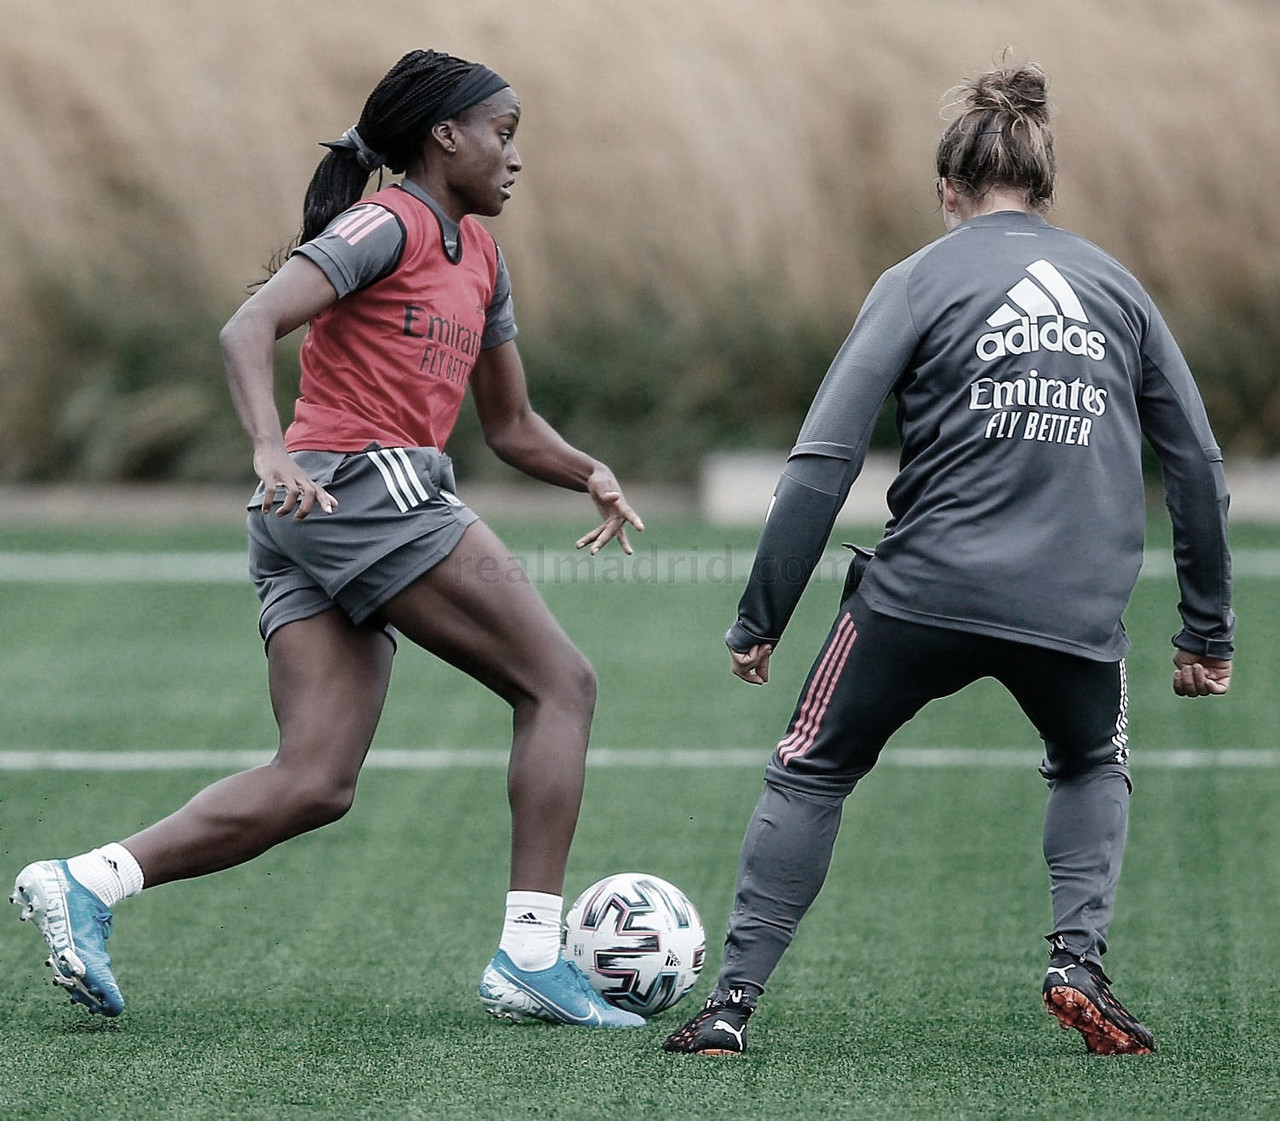 Convocatoria Real Madrid Femenino: todo listo para la jornada cinco